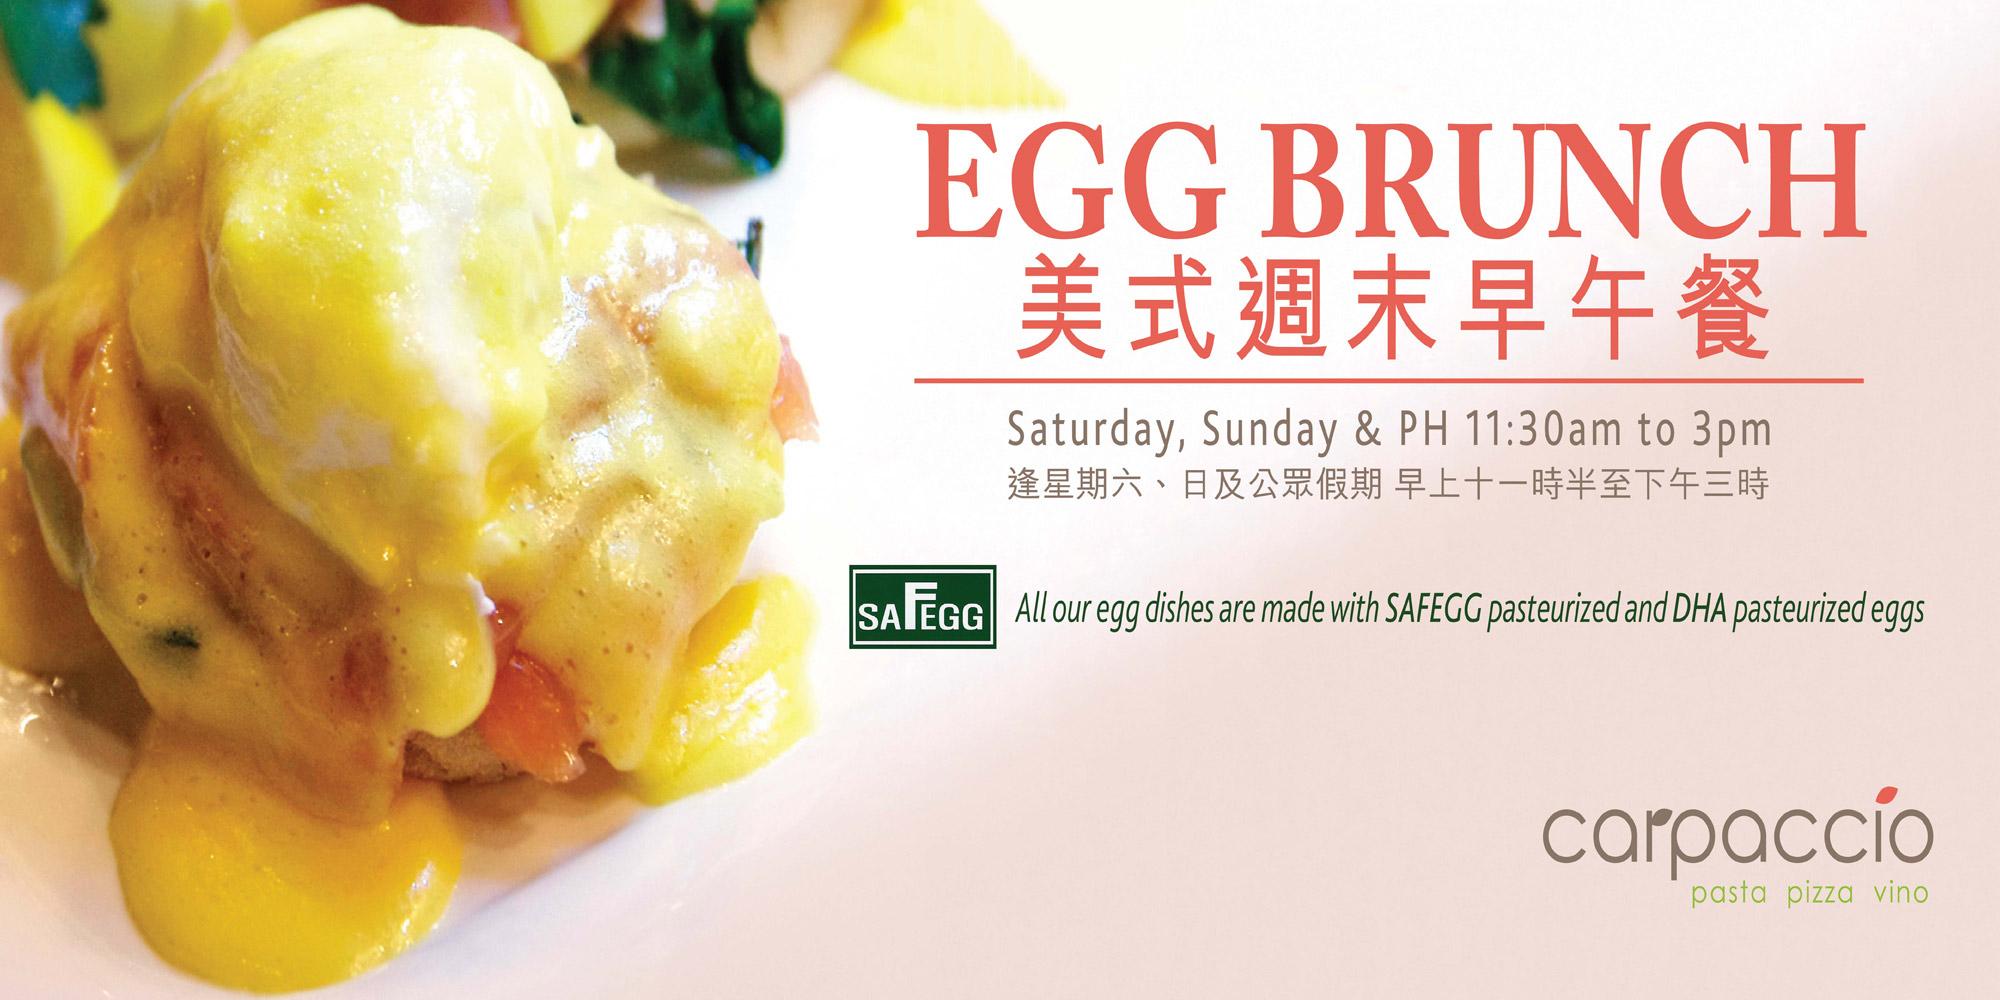 Carpaccio-Promotions-2015-Egg-brunch